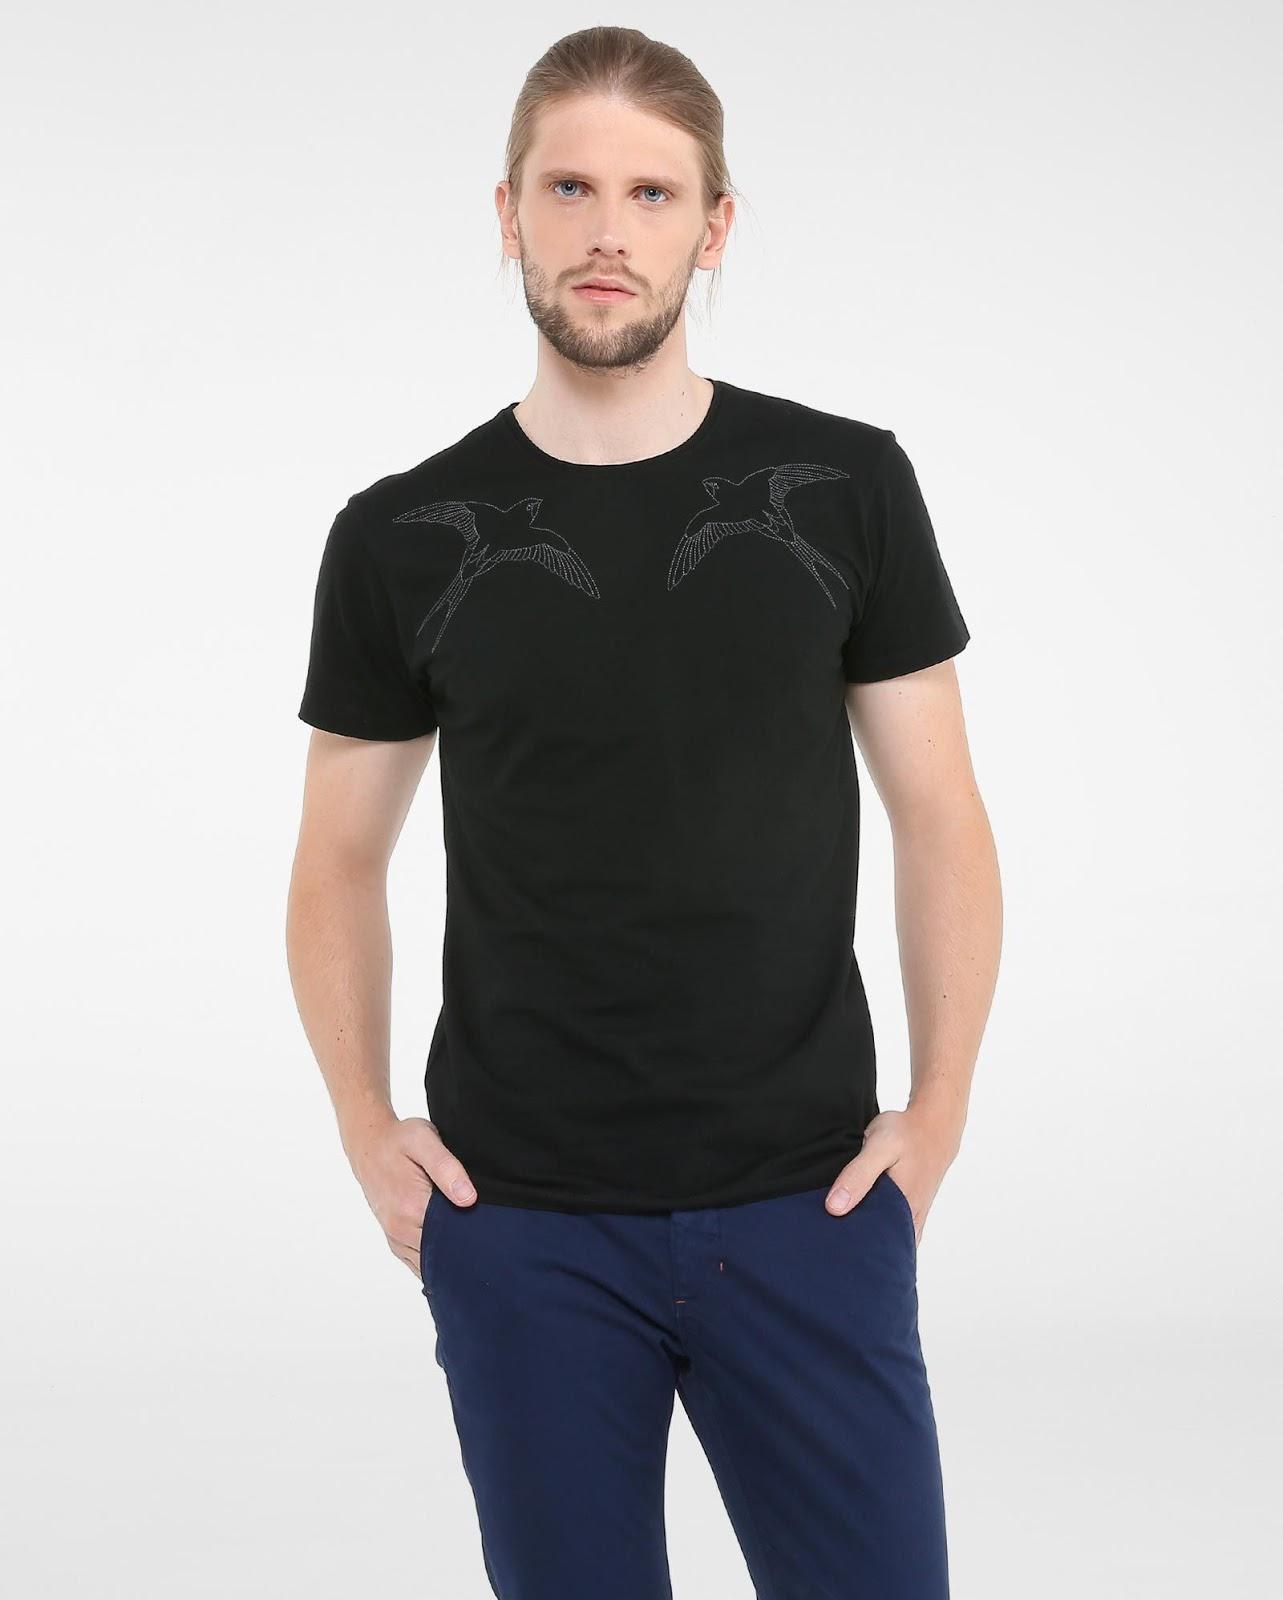 LEO KLEIN - KADU DANTAS PARA RIACHUELO - Camiseta Bordado Pássaros